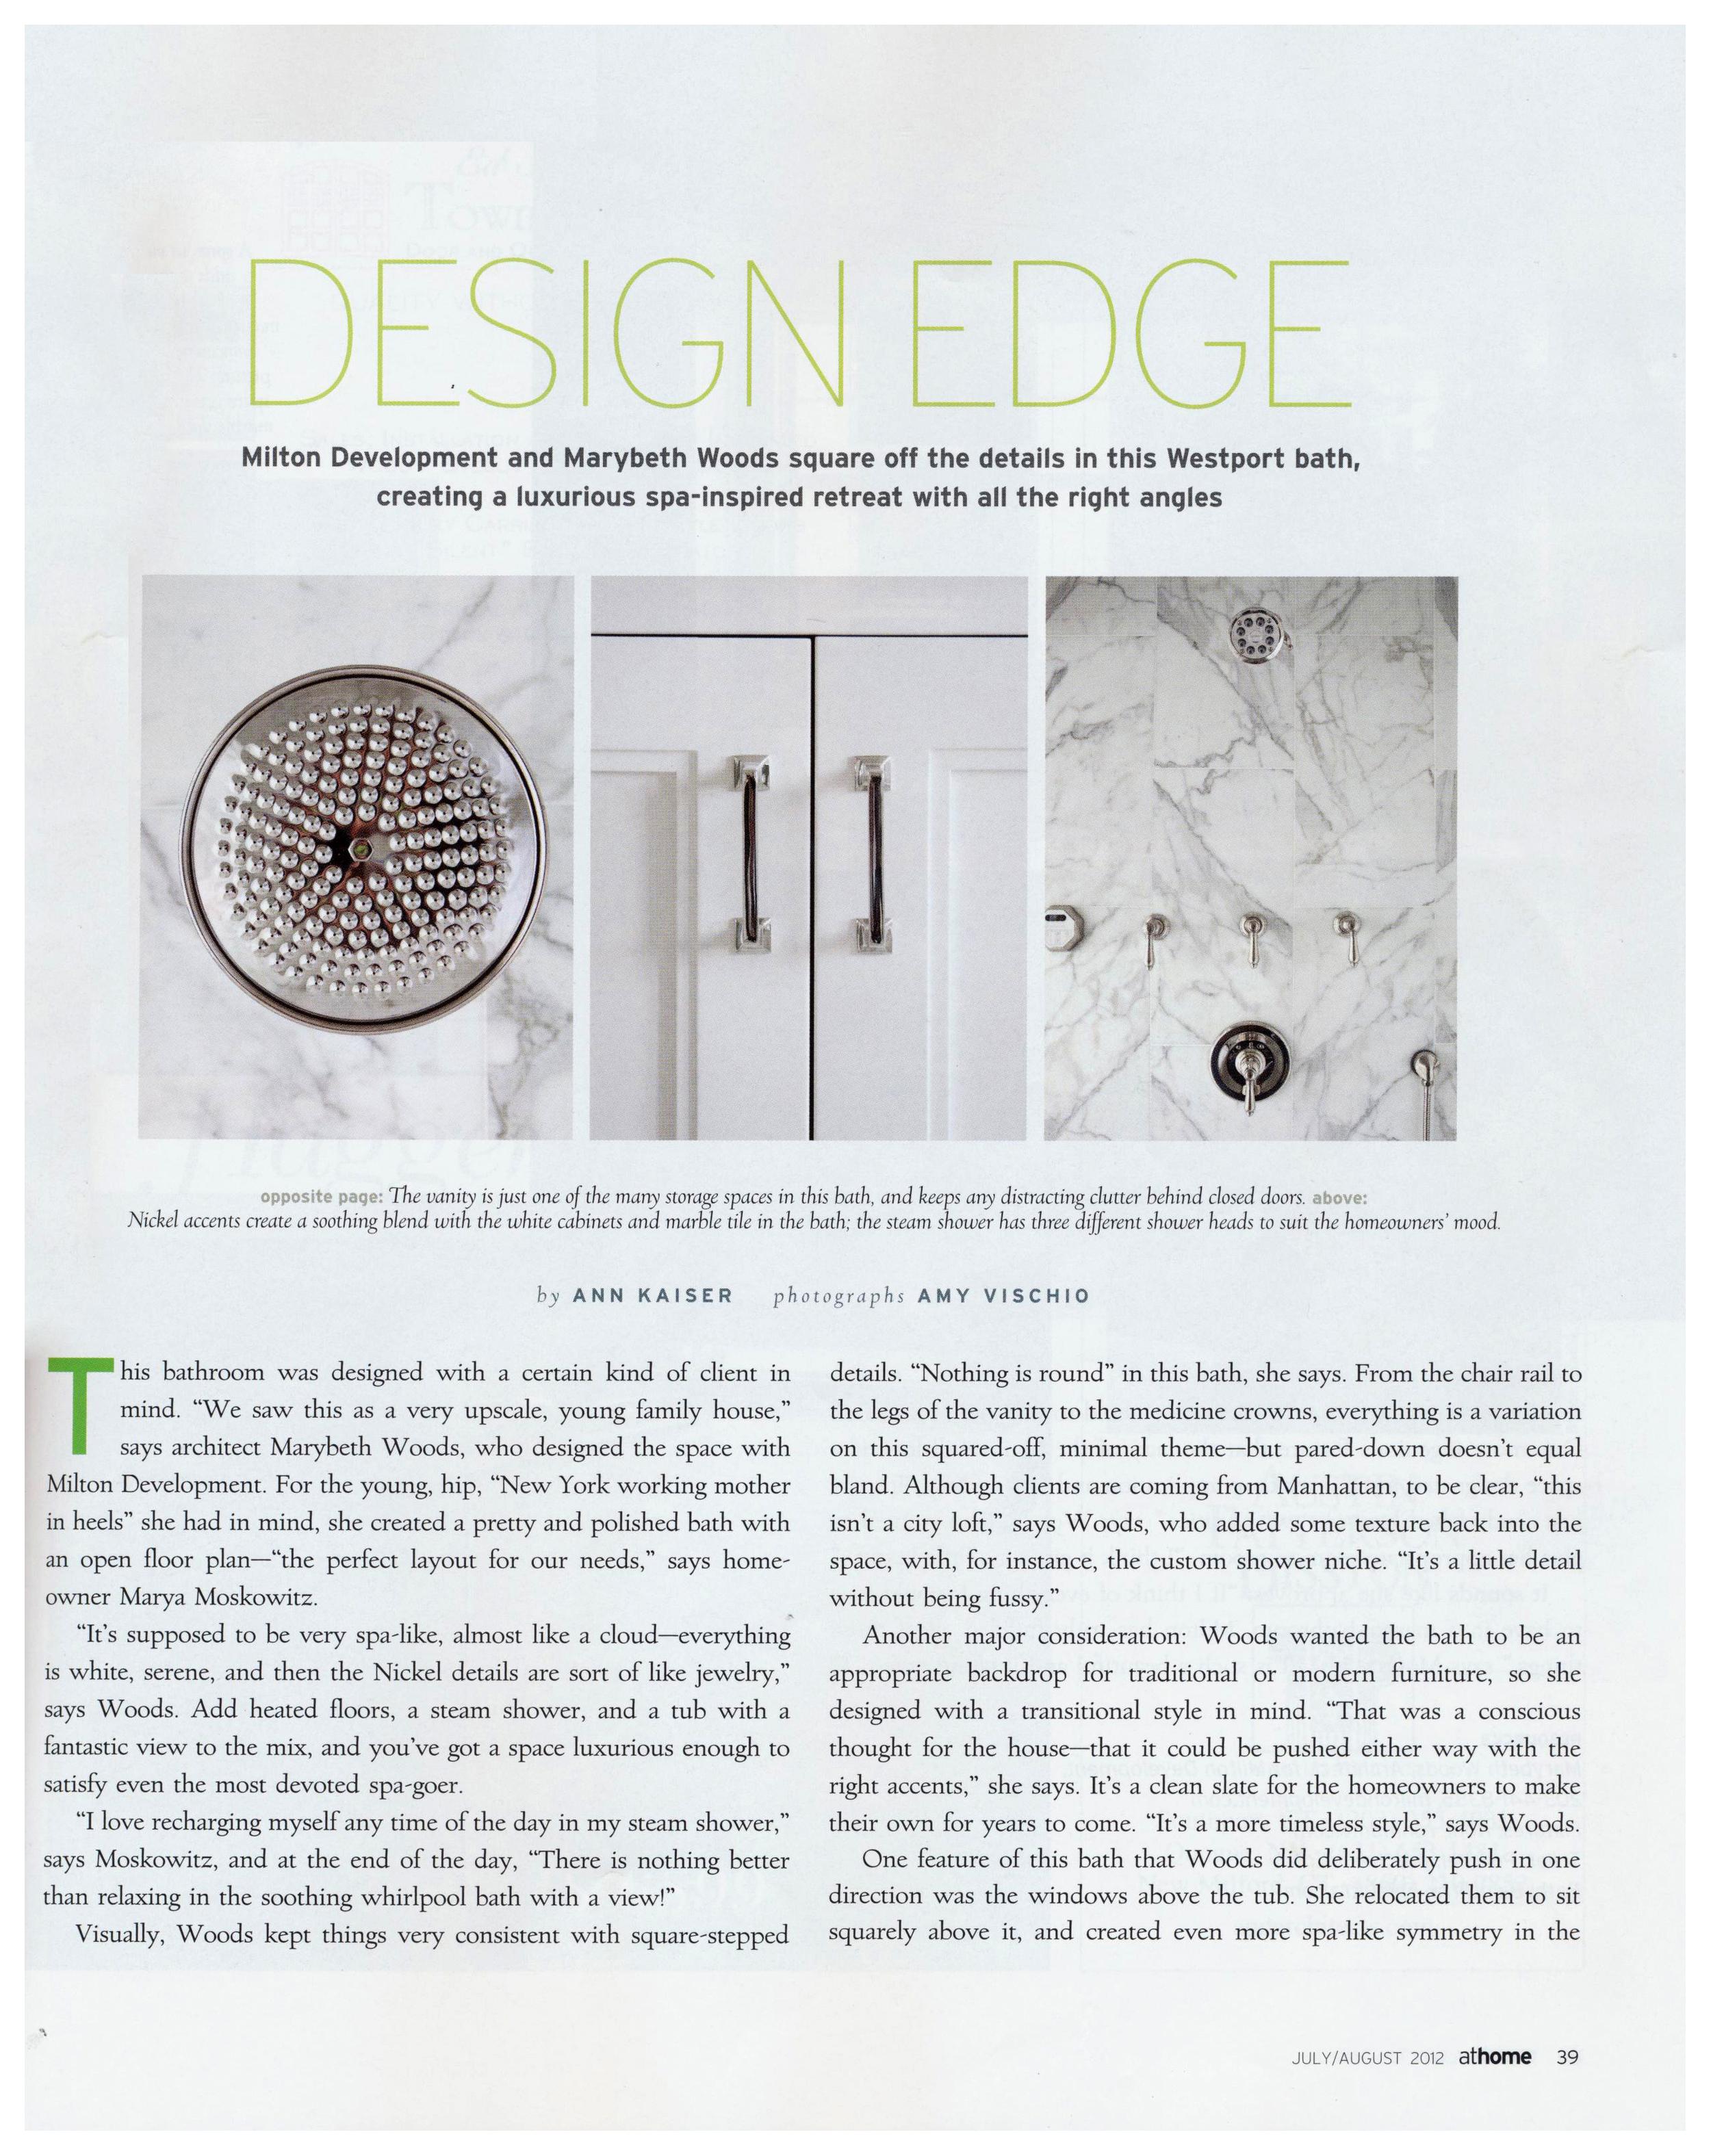 DesignEdgepage 2.jpg